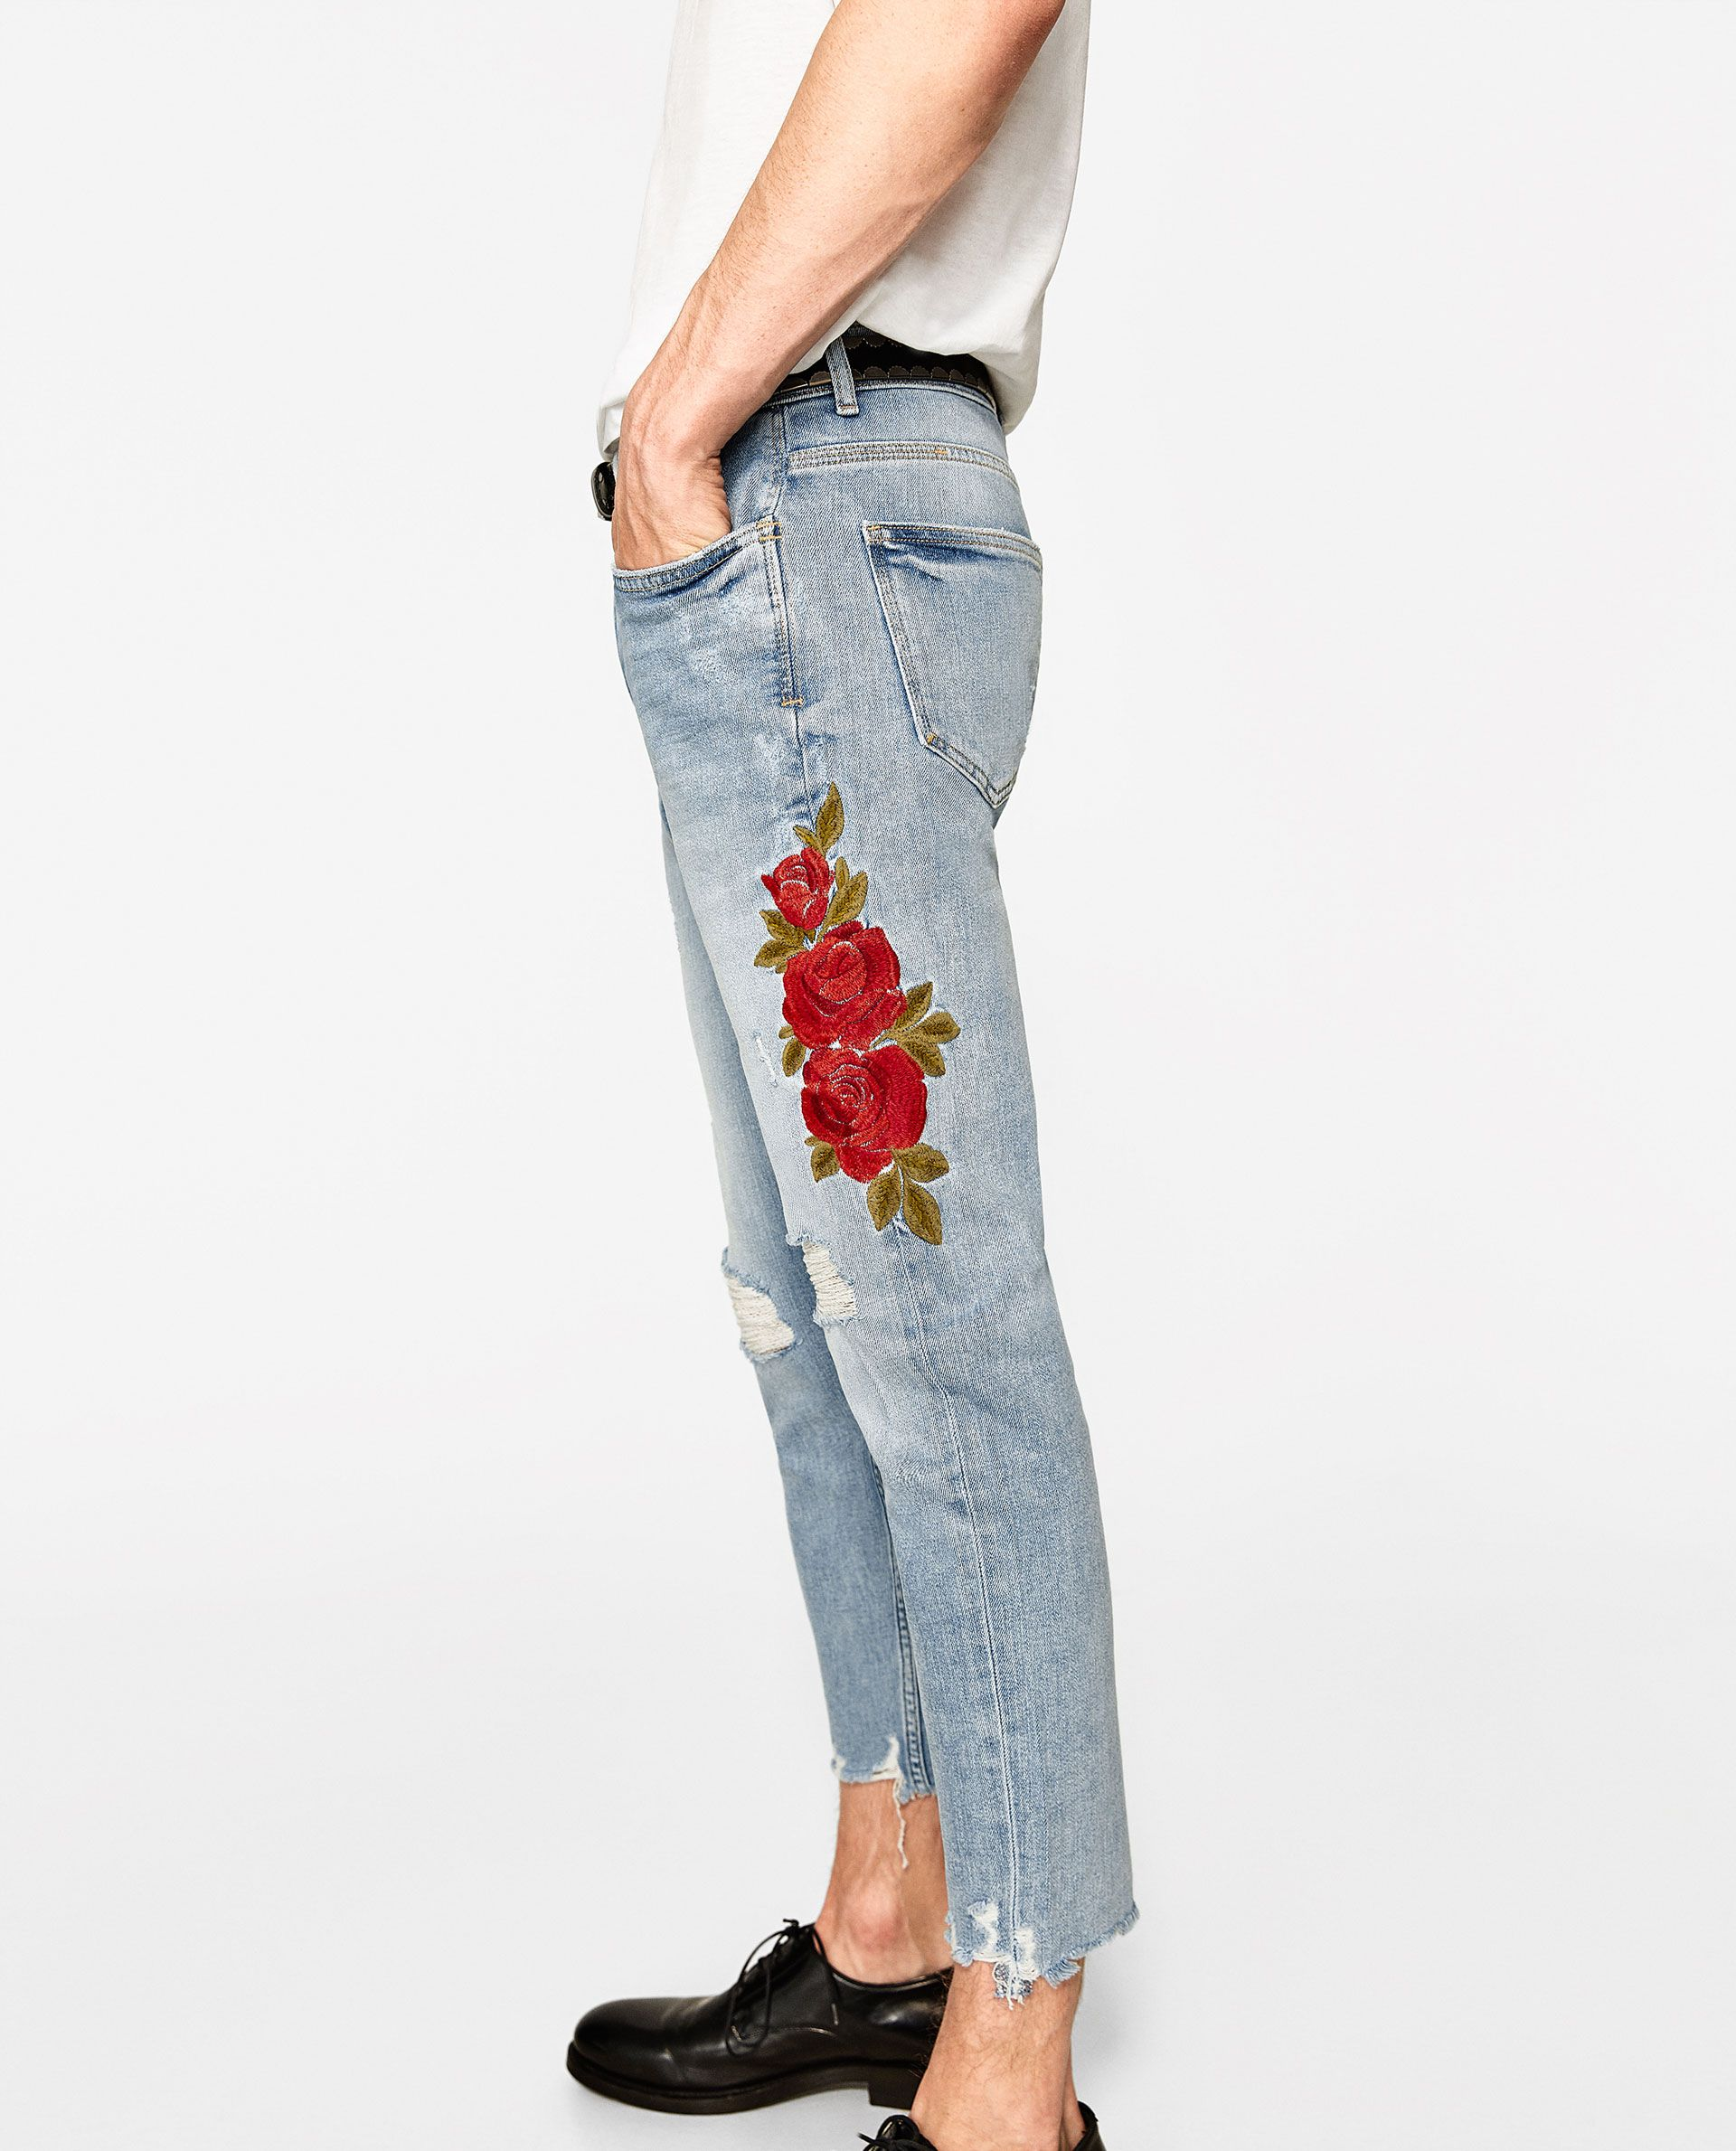 bba52bfcc85b ZARA Embroidered Jeans